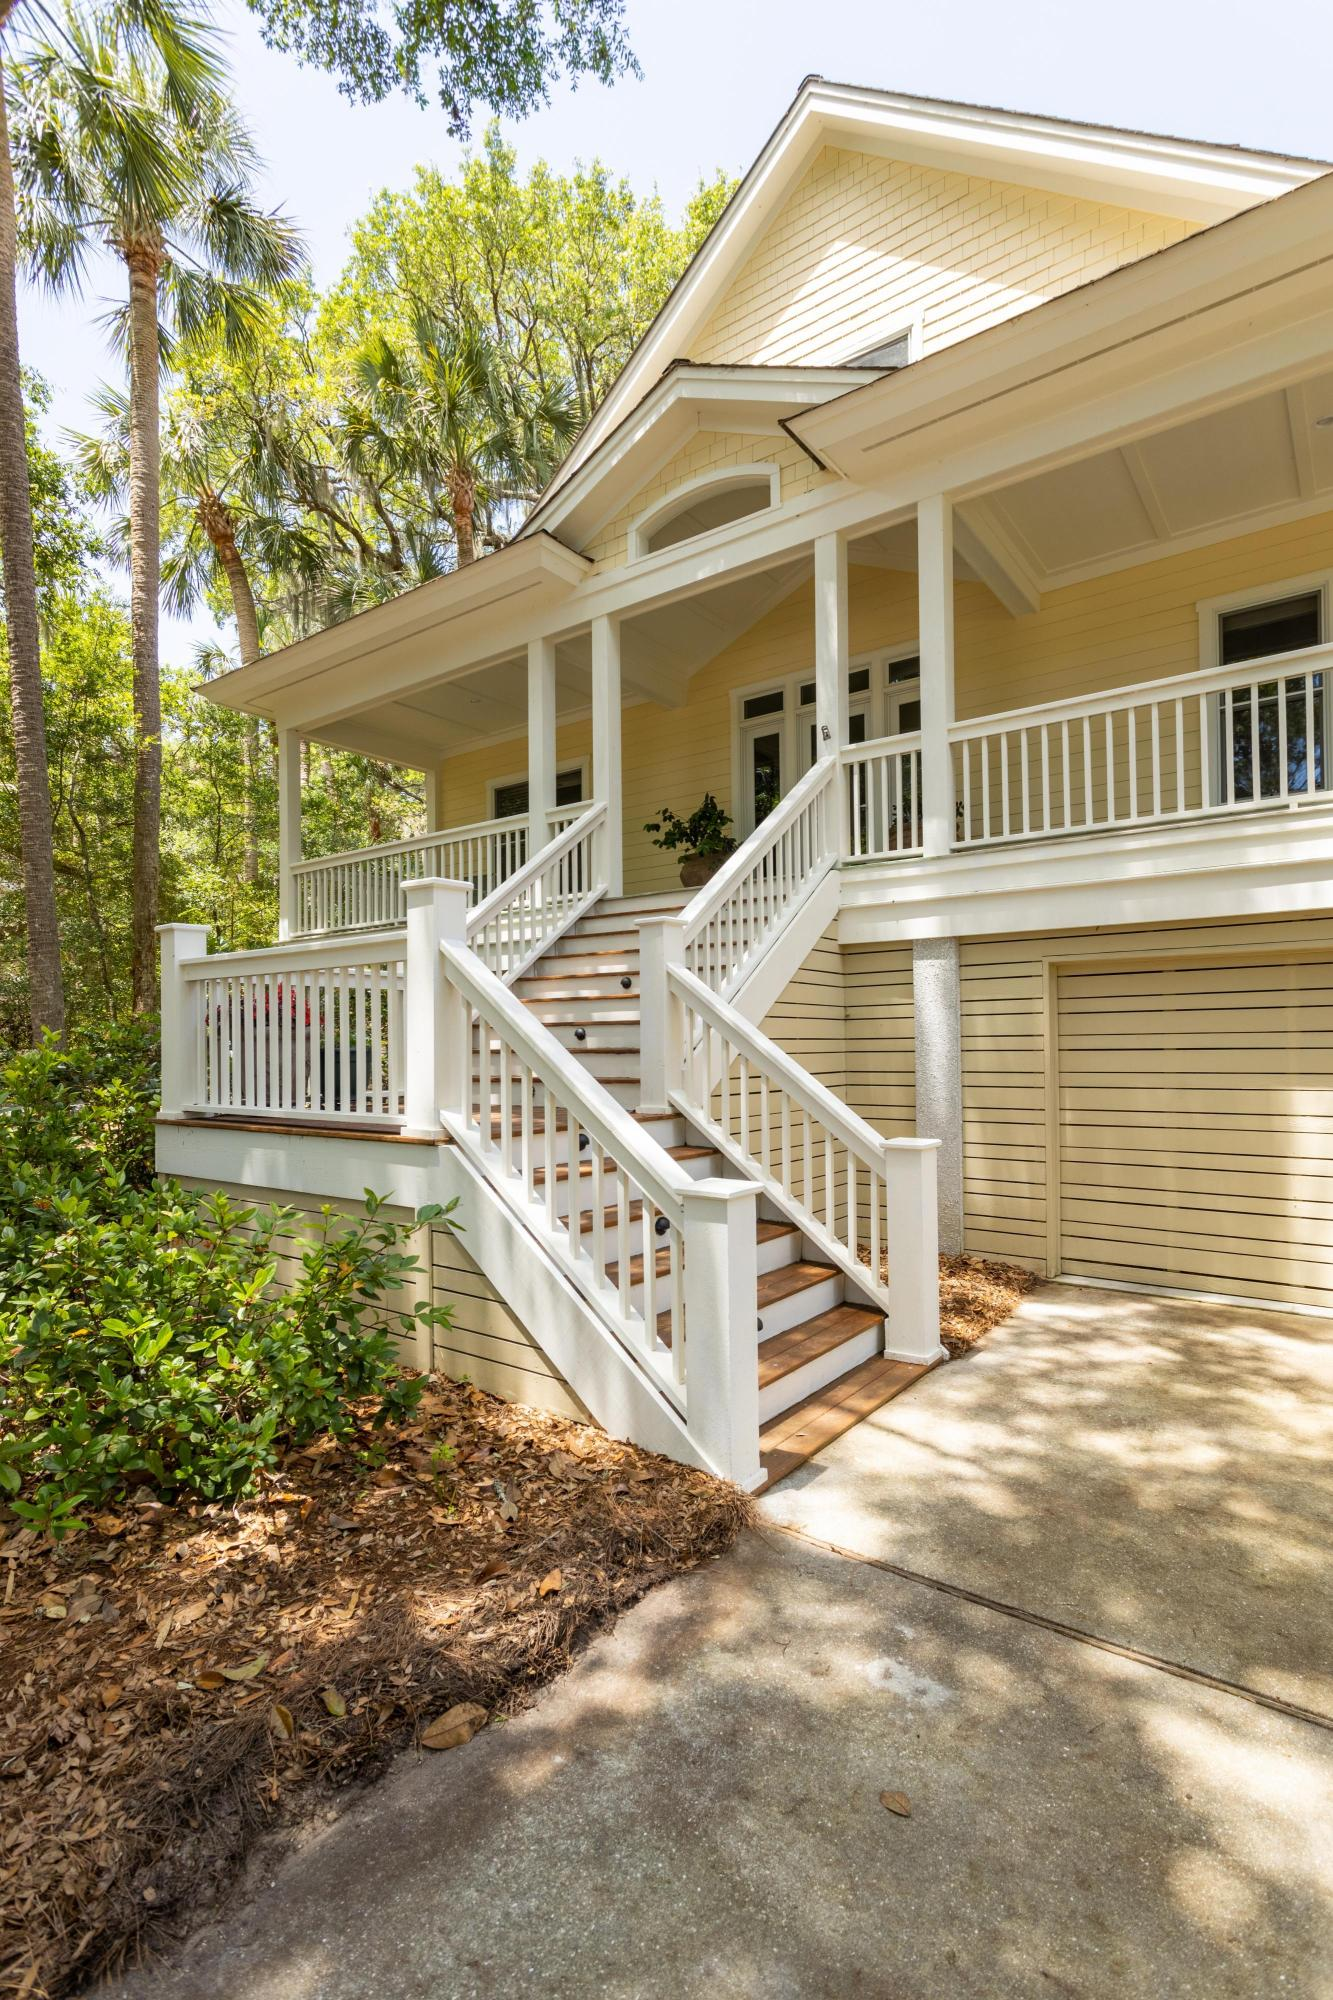 Seabrook Island Homes For Sale - 1014 Crooked Oaks, Seabrook Island, SC - 52